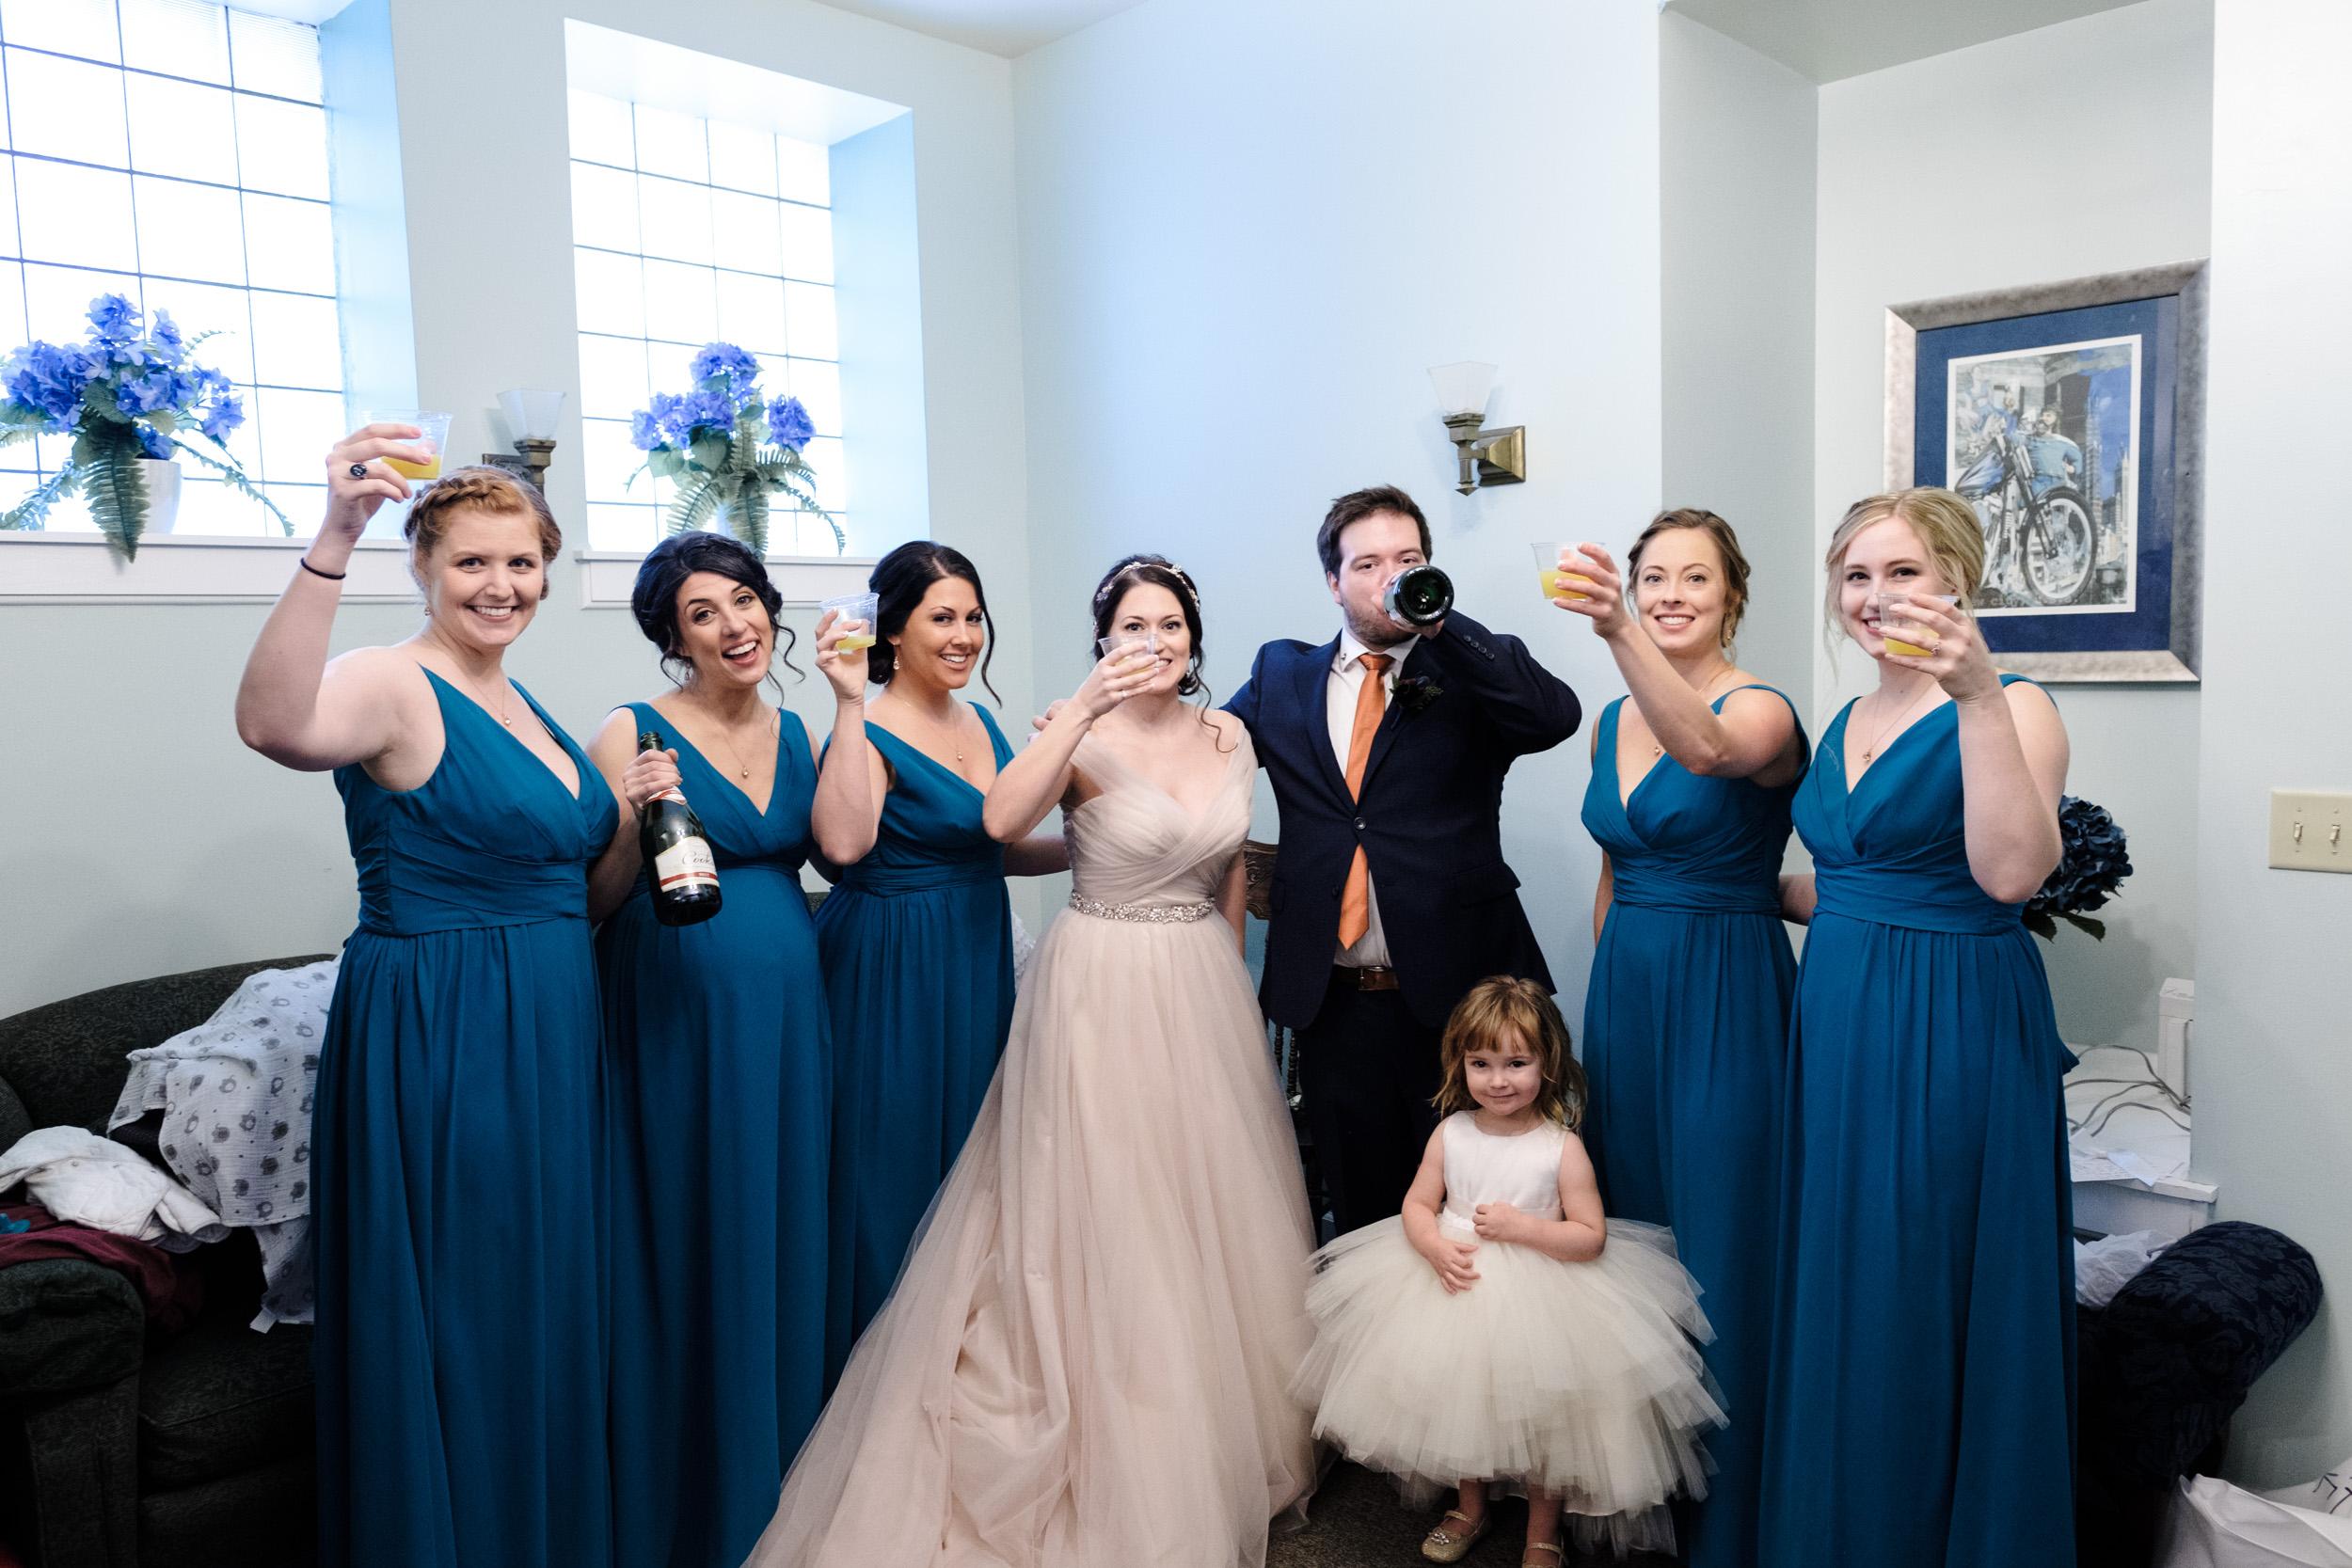 joyful wedding photo of bride and her bridesmaids